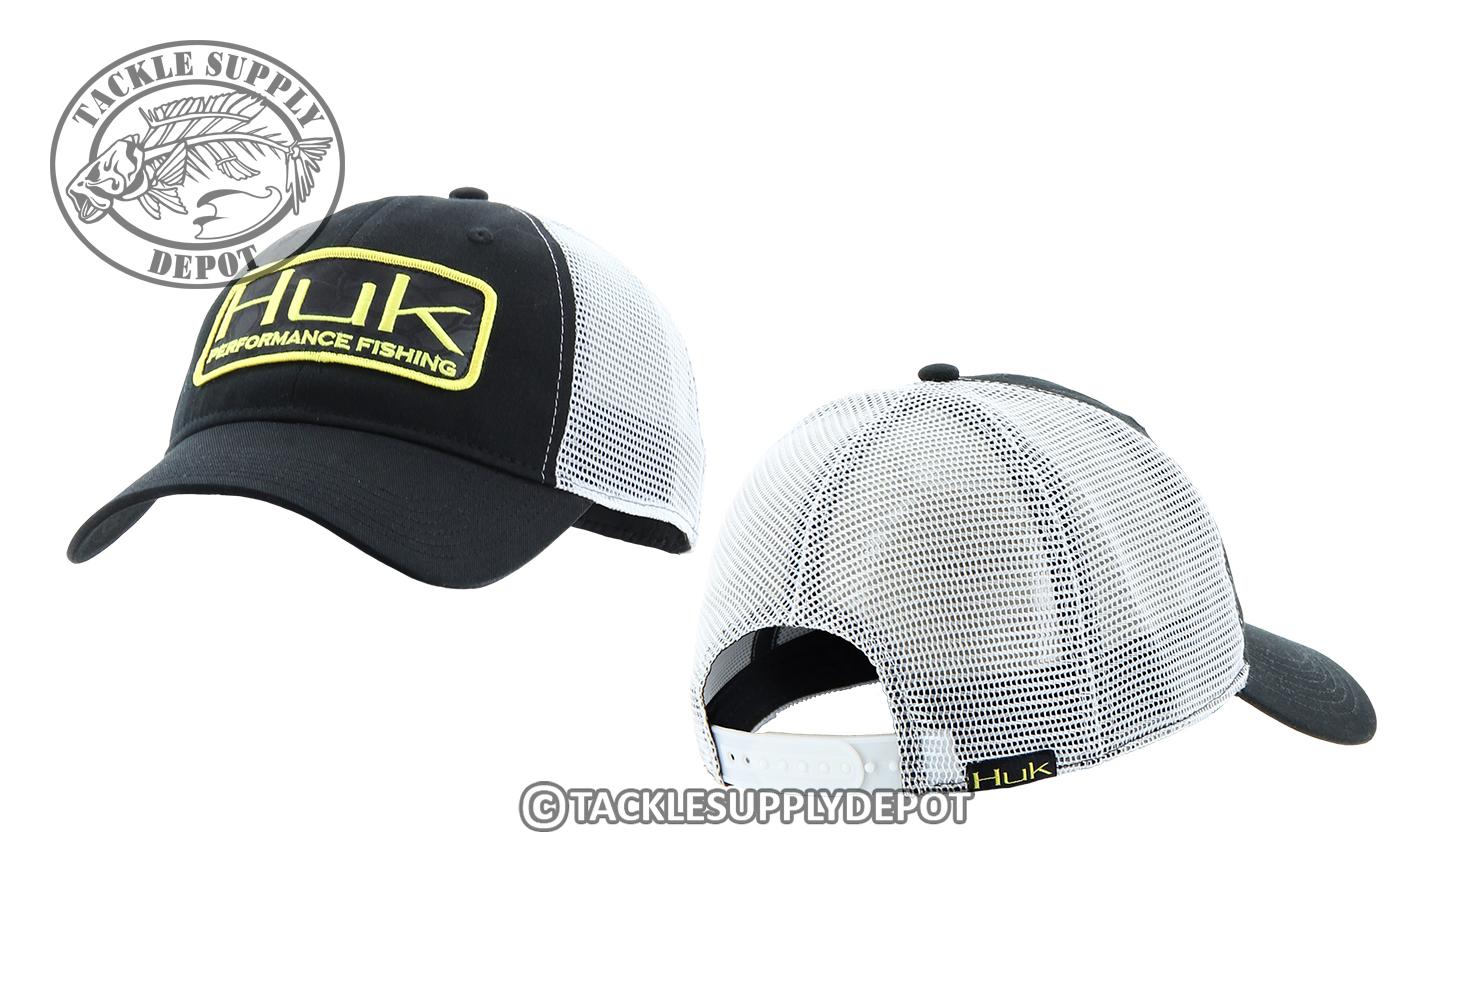 Huk fishing kryptek patch trucker hat cap h3000015 see for Huk fishing hats